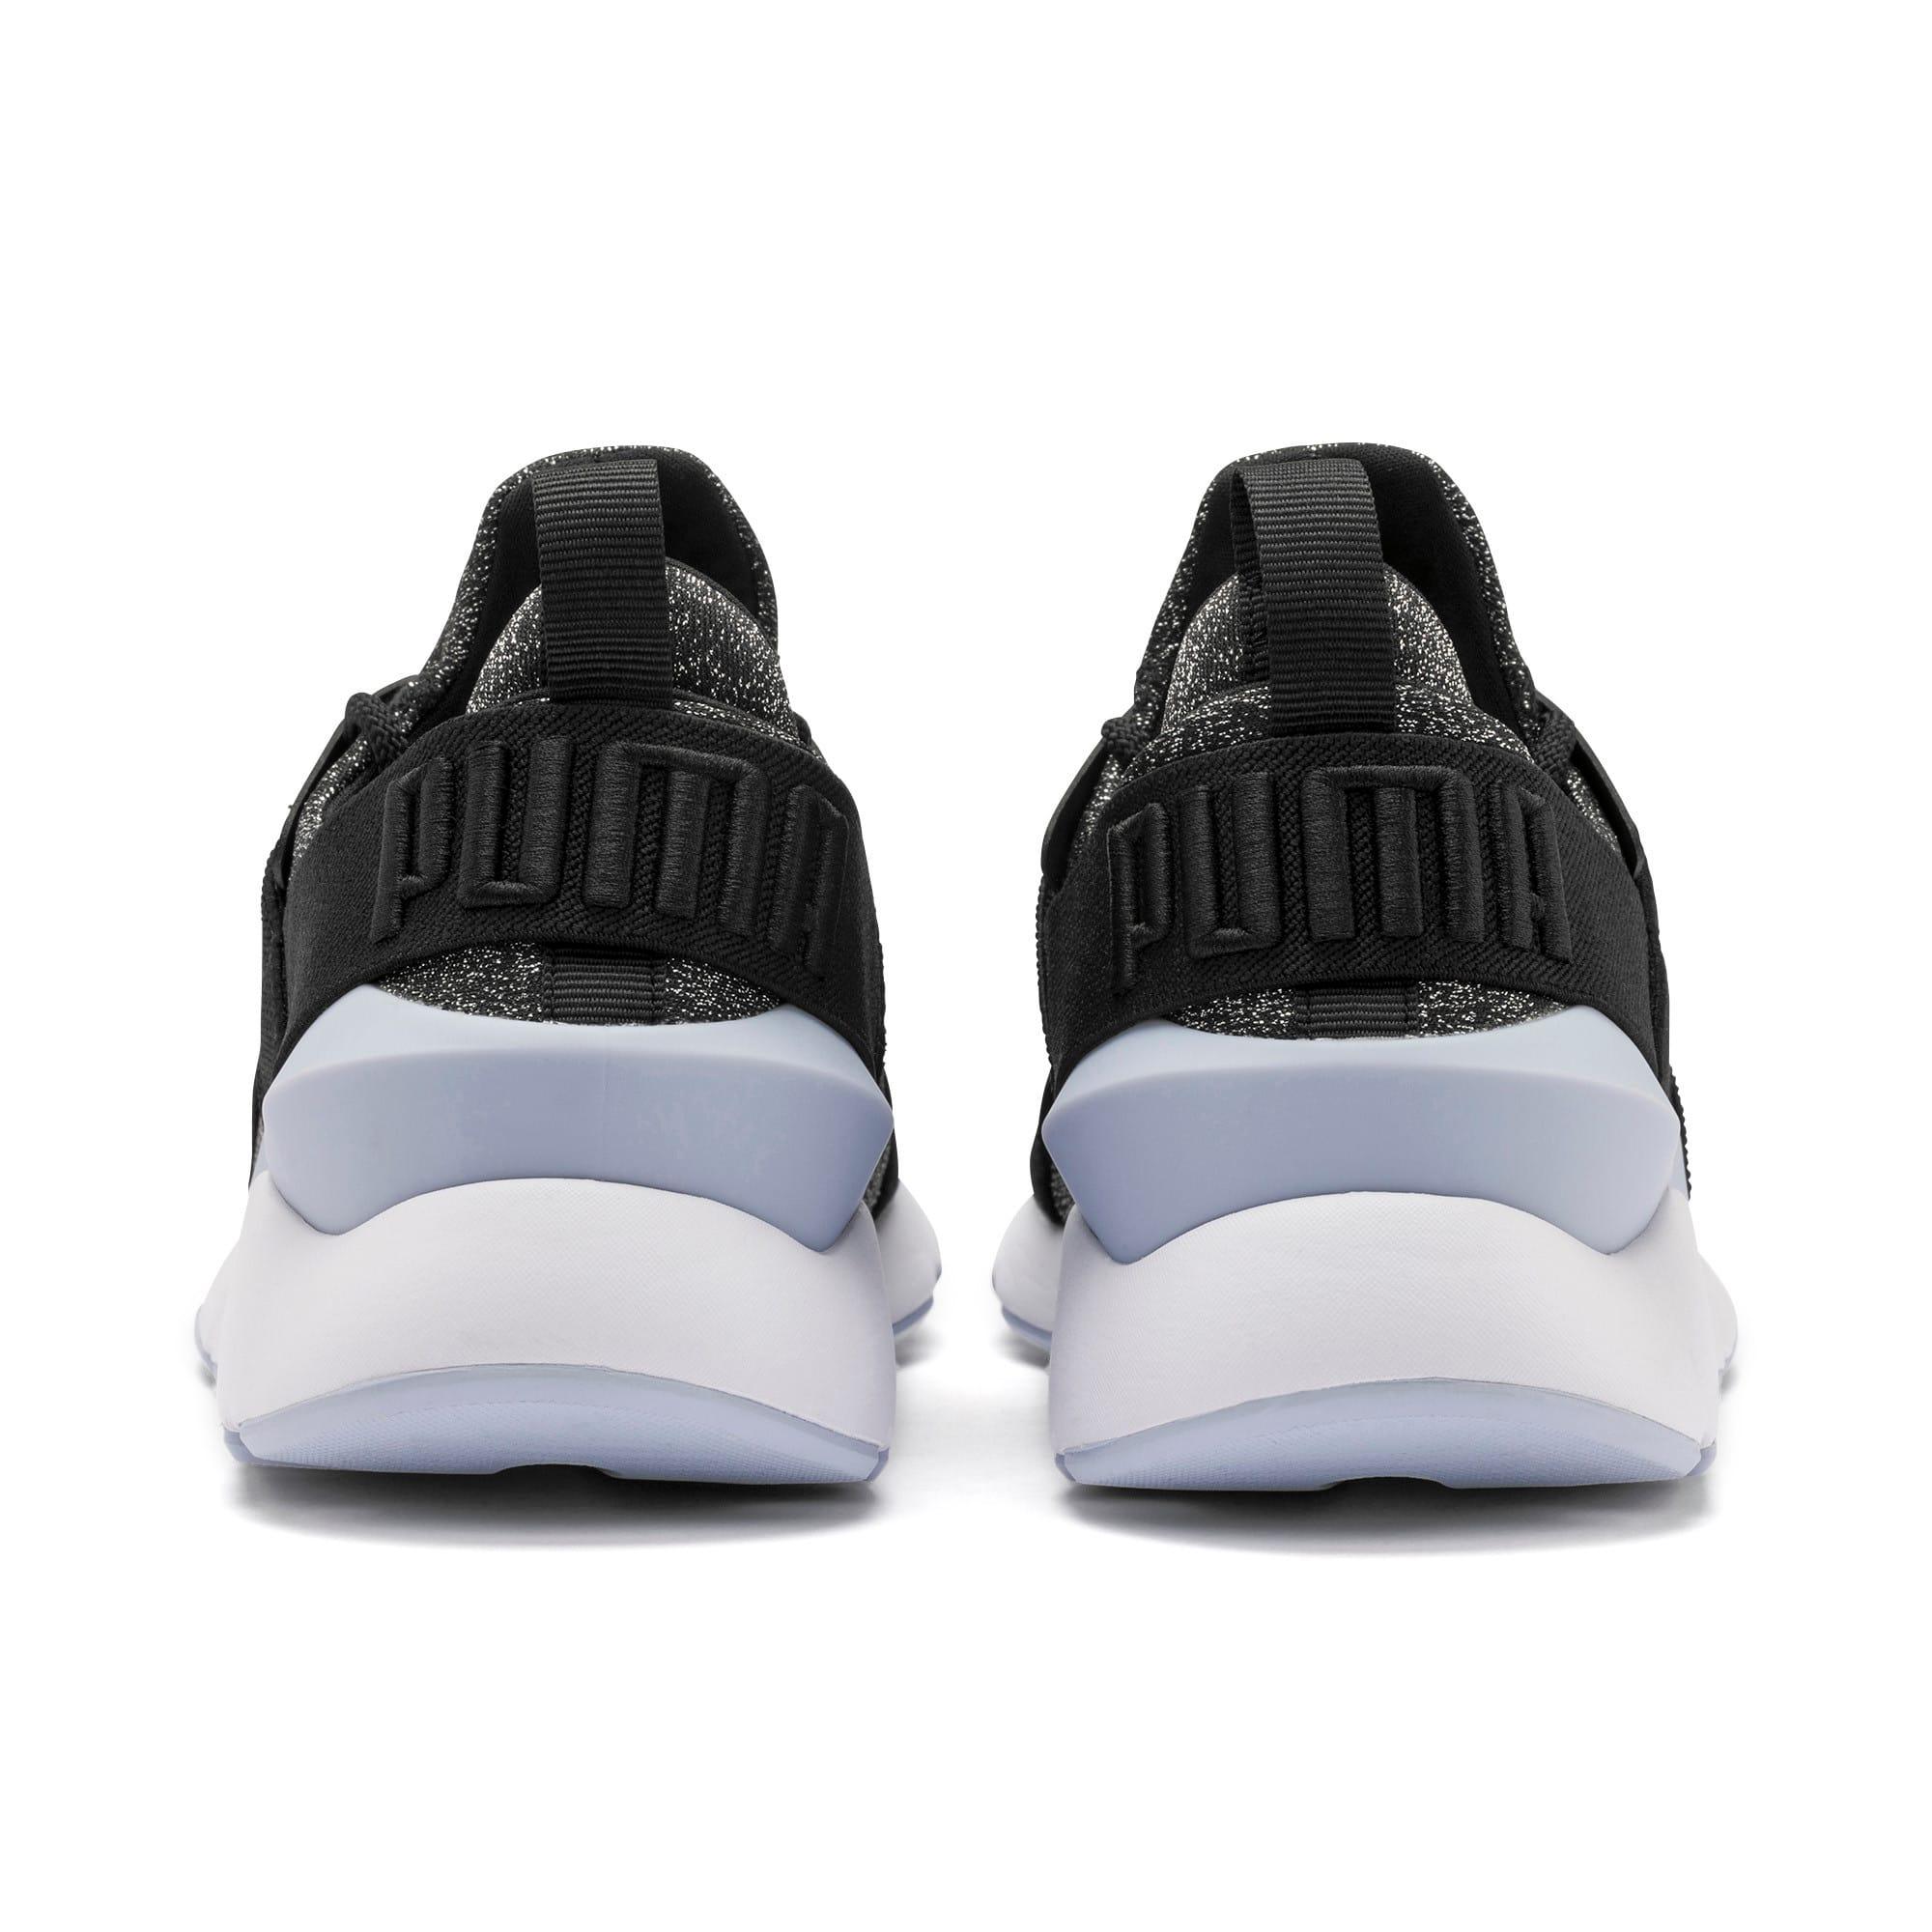 Thumbnail 3 of Muse Shift Sneakers JR, Puma Black-Heather, medium